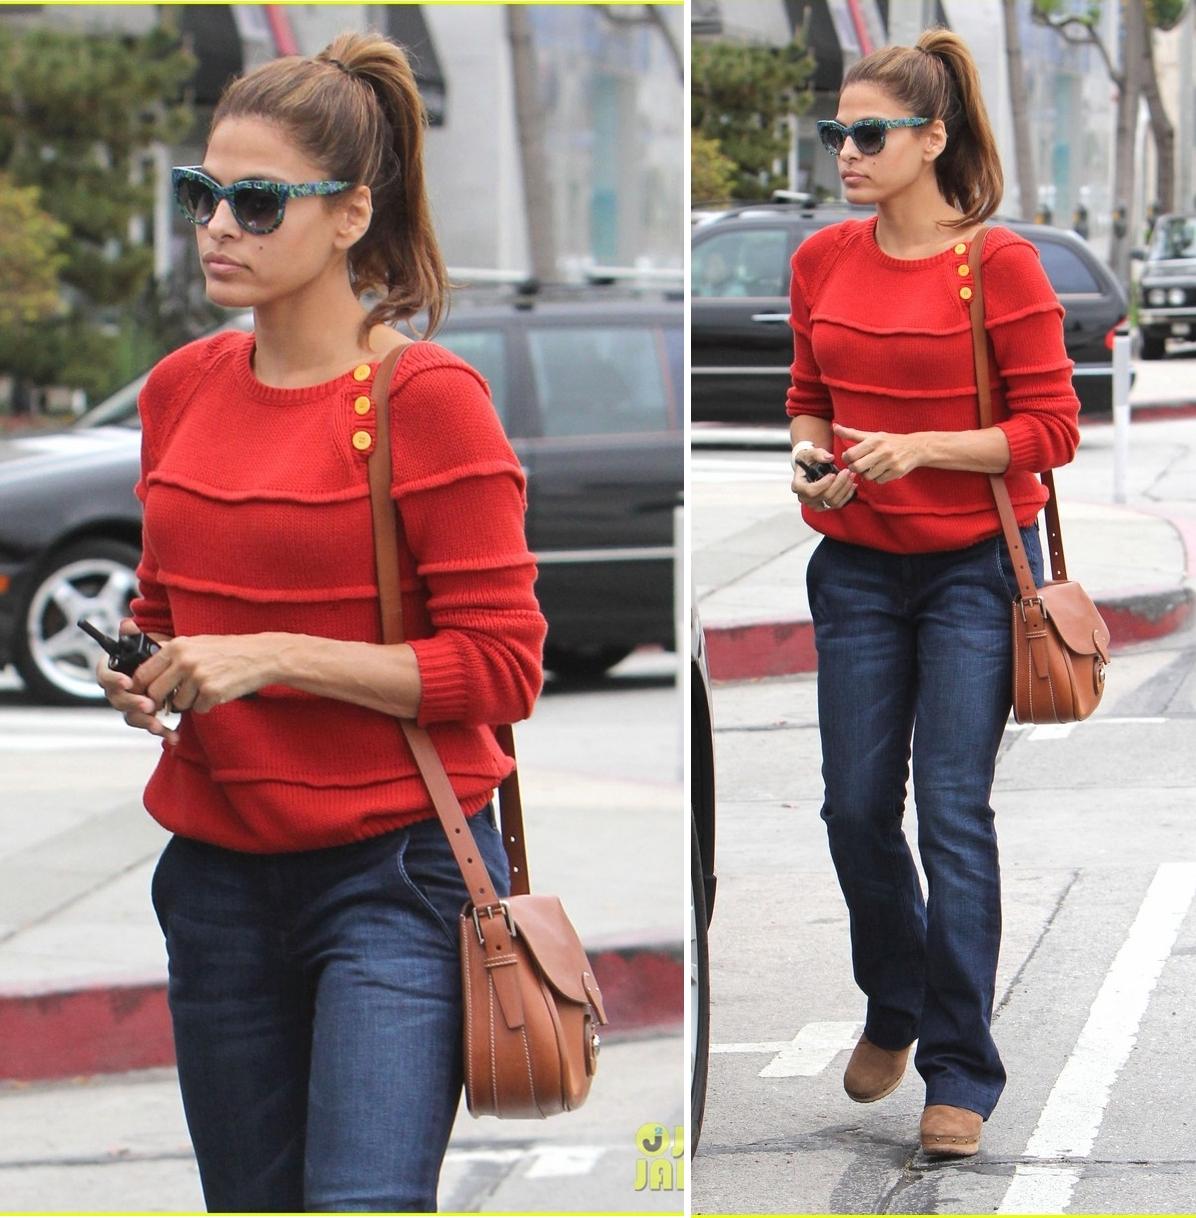 http://3.bp.blogspot.com/-Pox2KoXucrA/T5qMphGxYQI/AAAAAAAAHfU/WQ_F_wUCGFA/s1600/eva-mendes-red-sweater-shopping-01.jpg